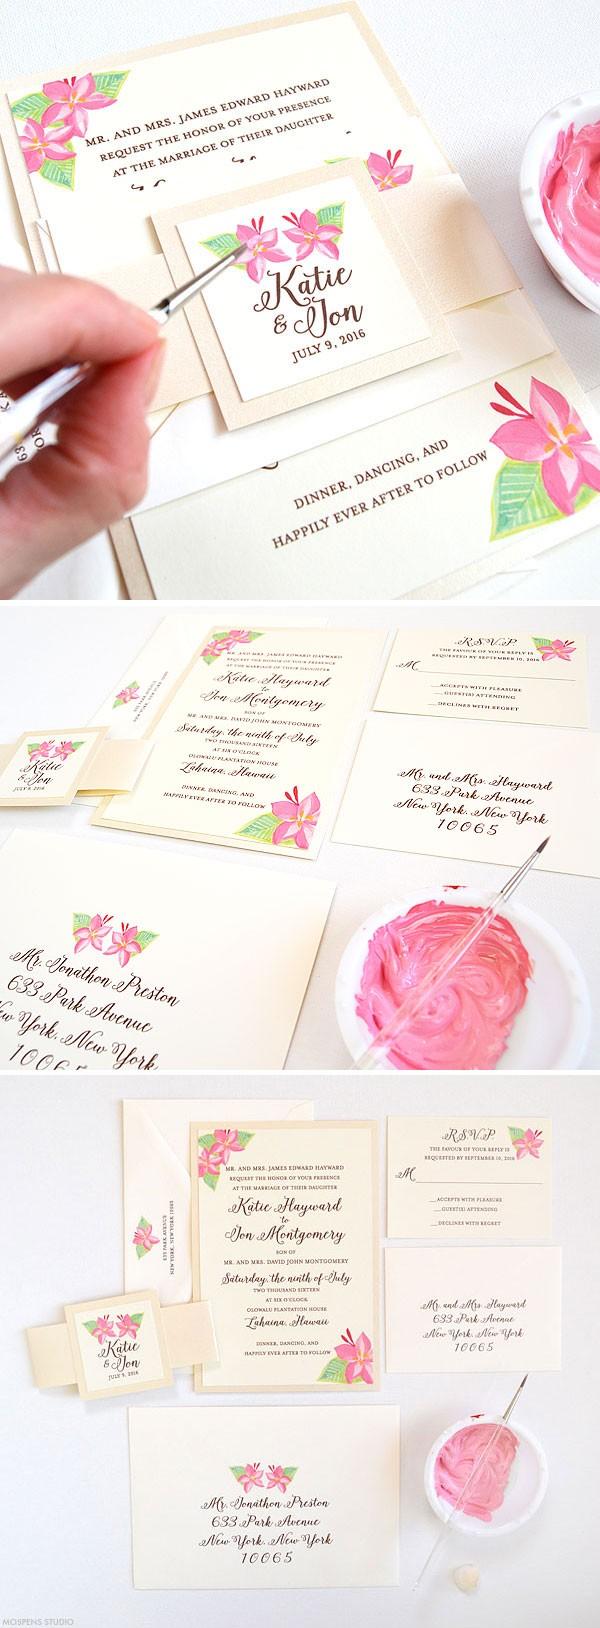 Hand painted floral wedding invitations - www.mospensstudio.com